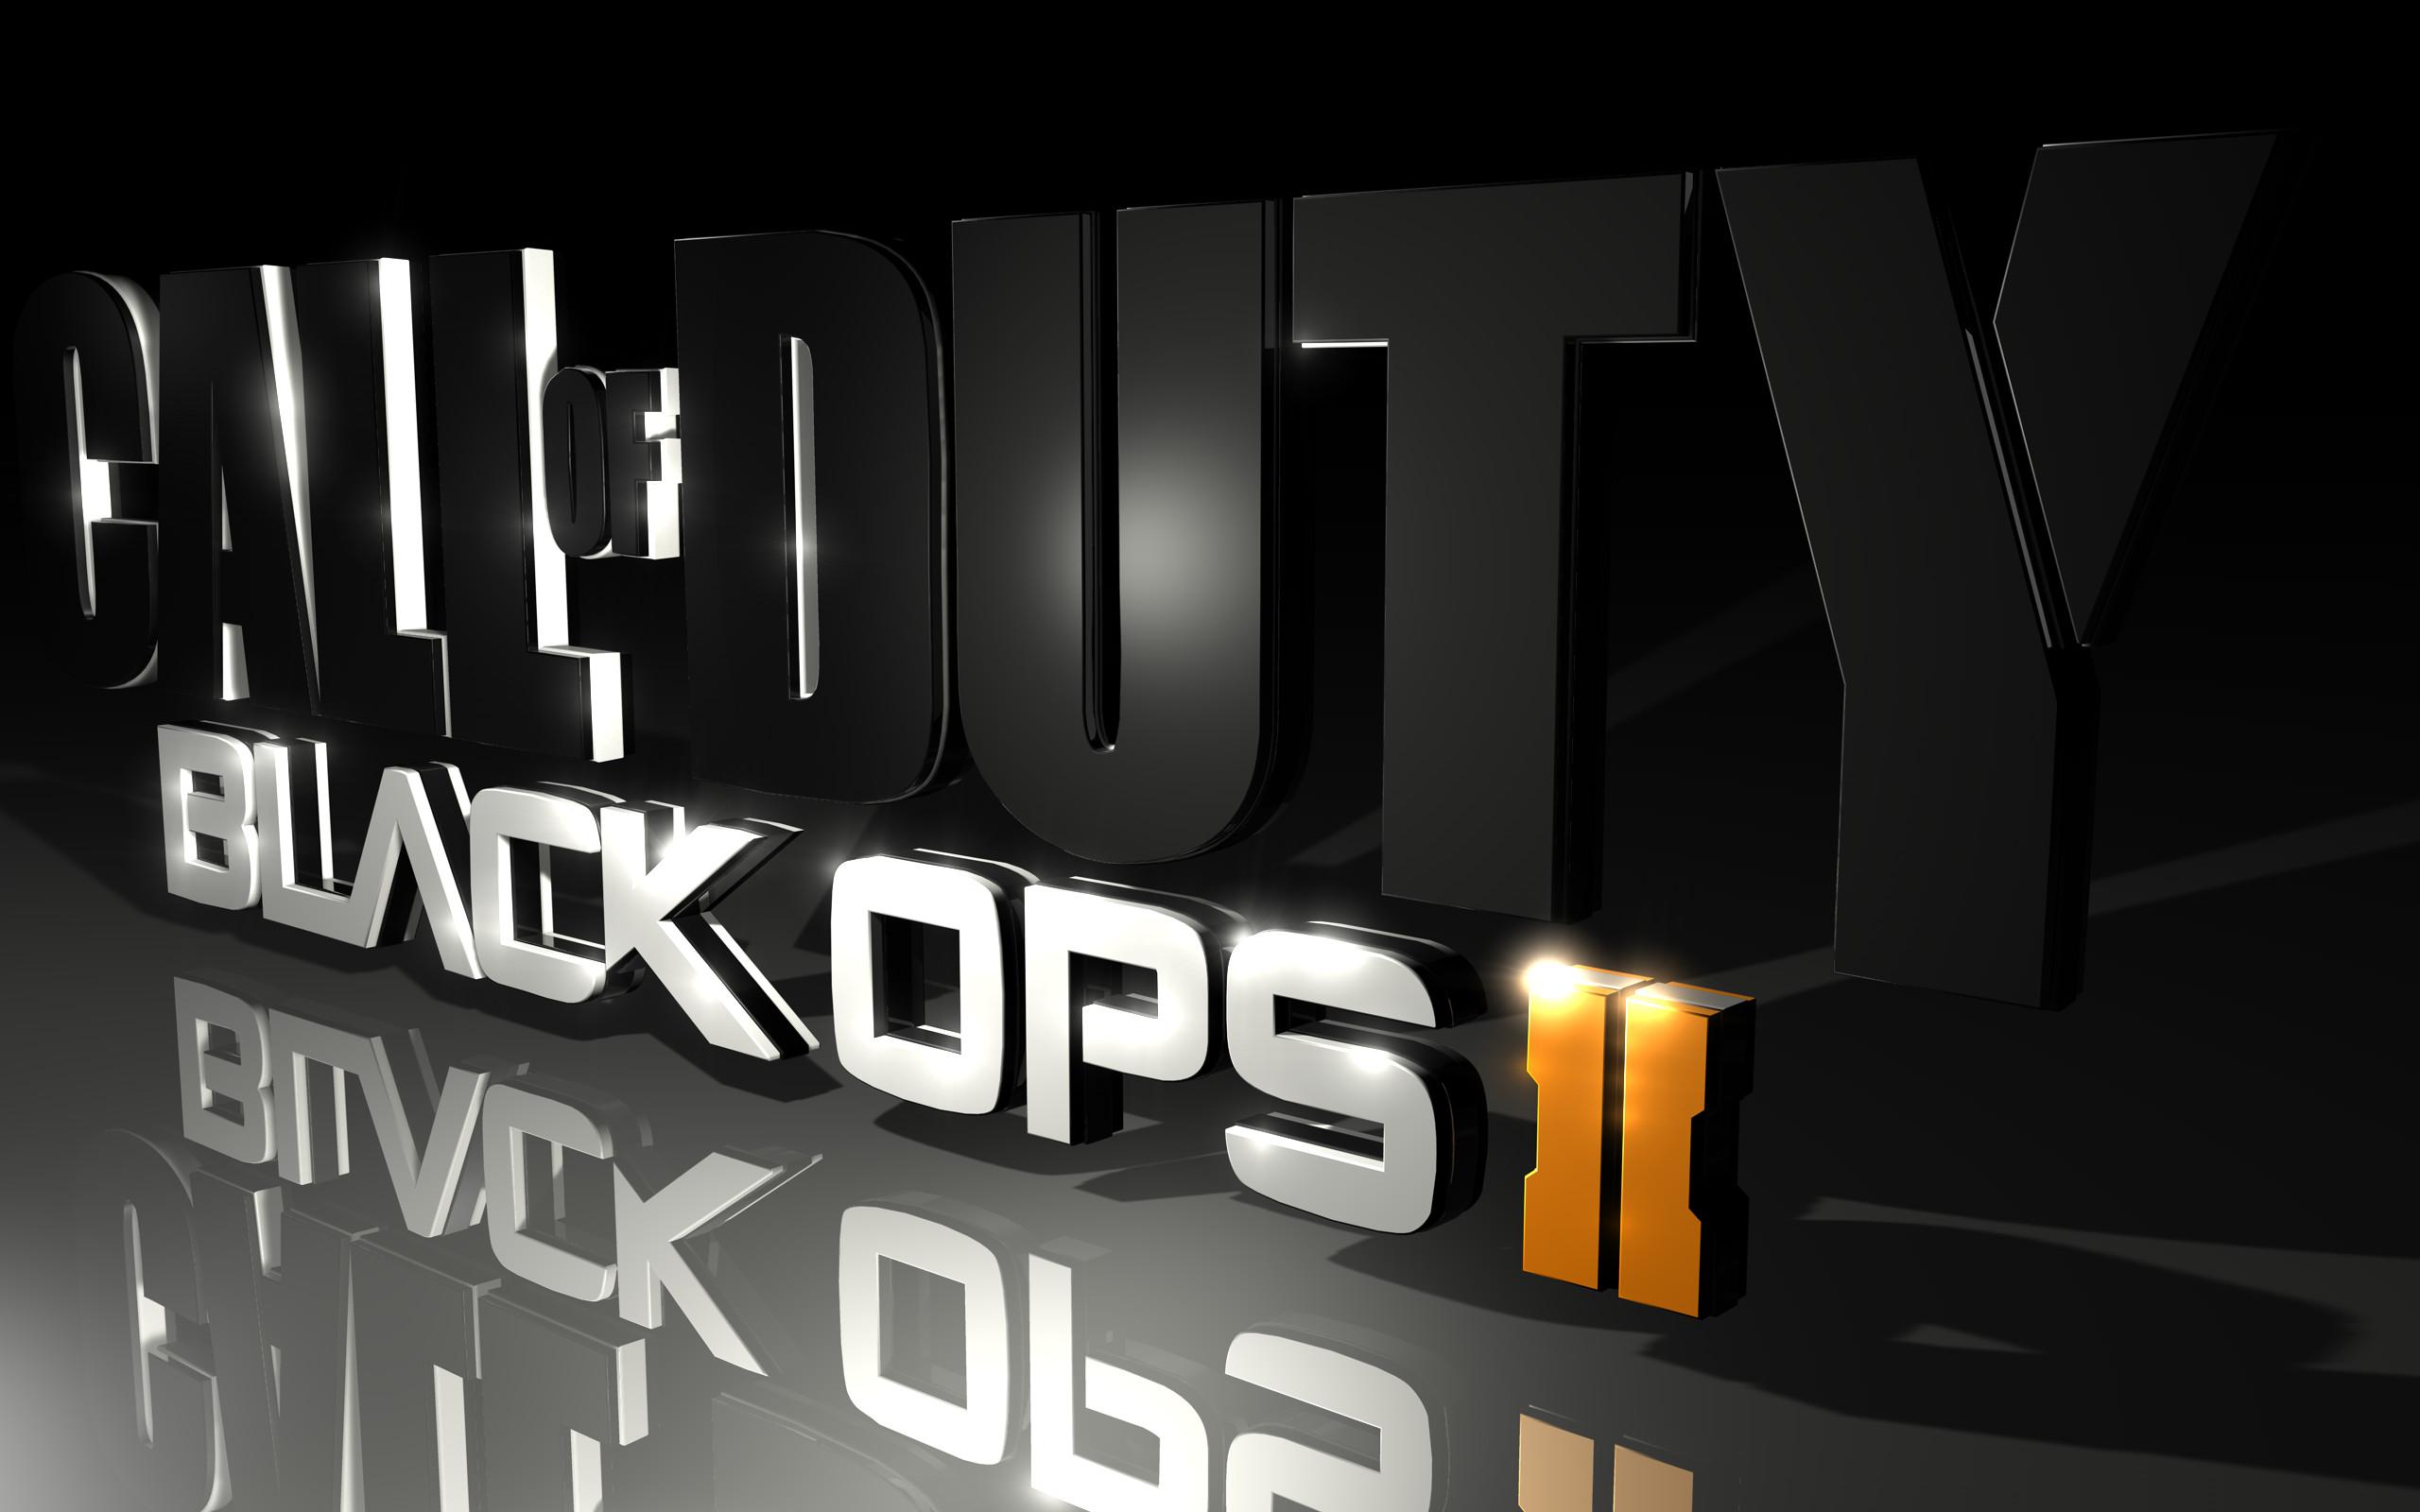 black ops 2 logo hdblack ops 2 wallpaper iphone 5 HD Wallpaper and .